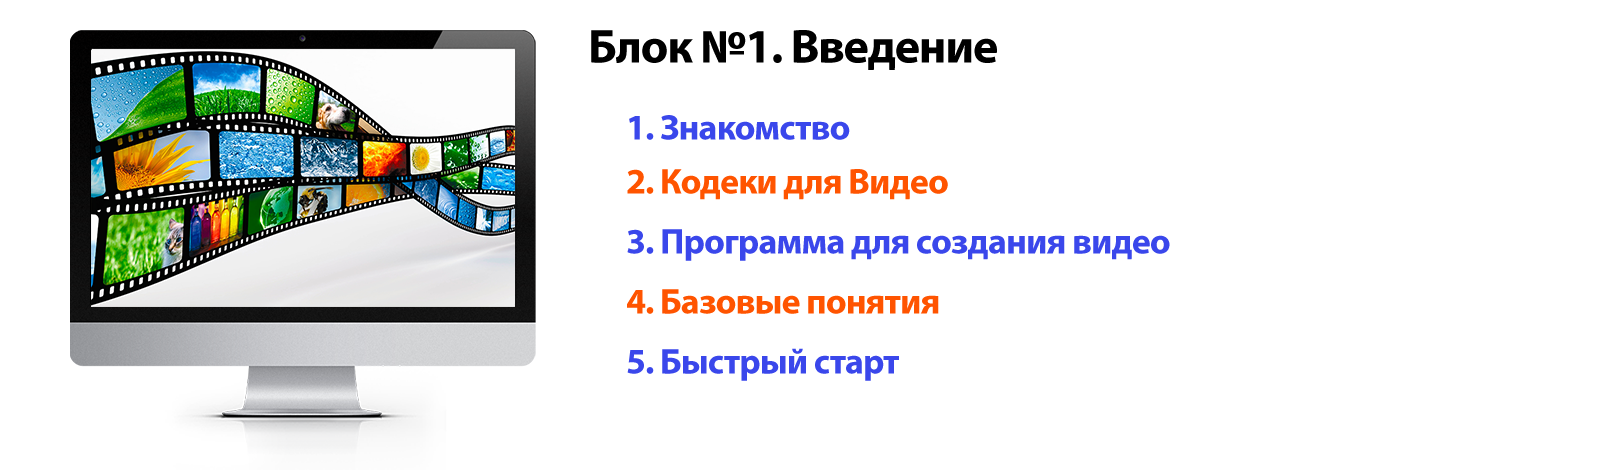 Blok_1_video